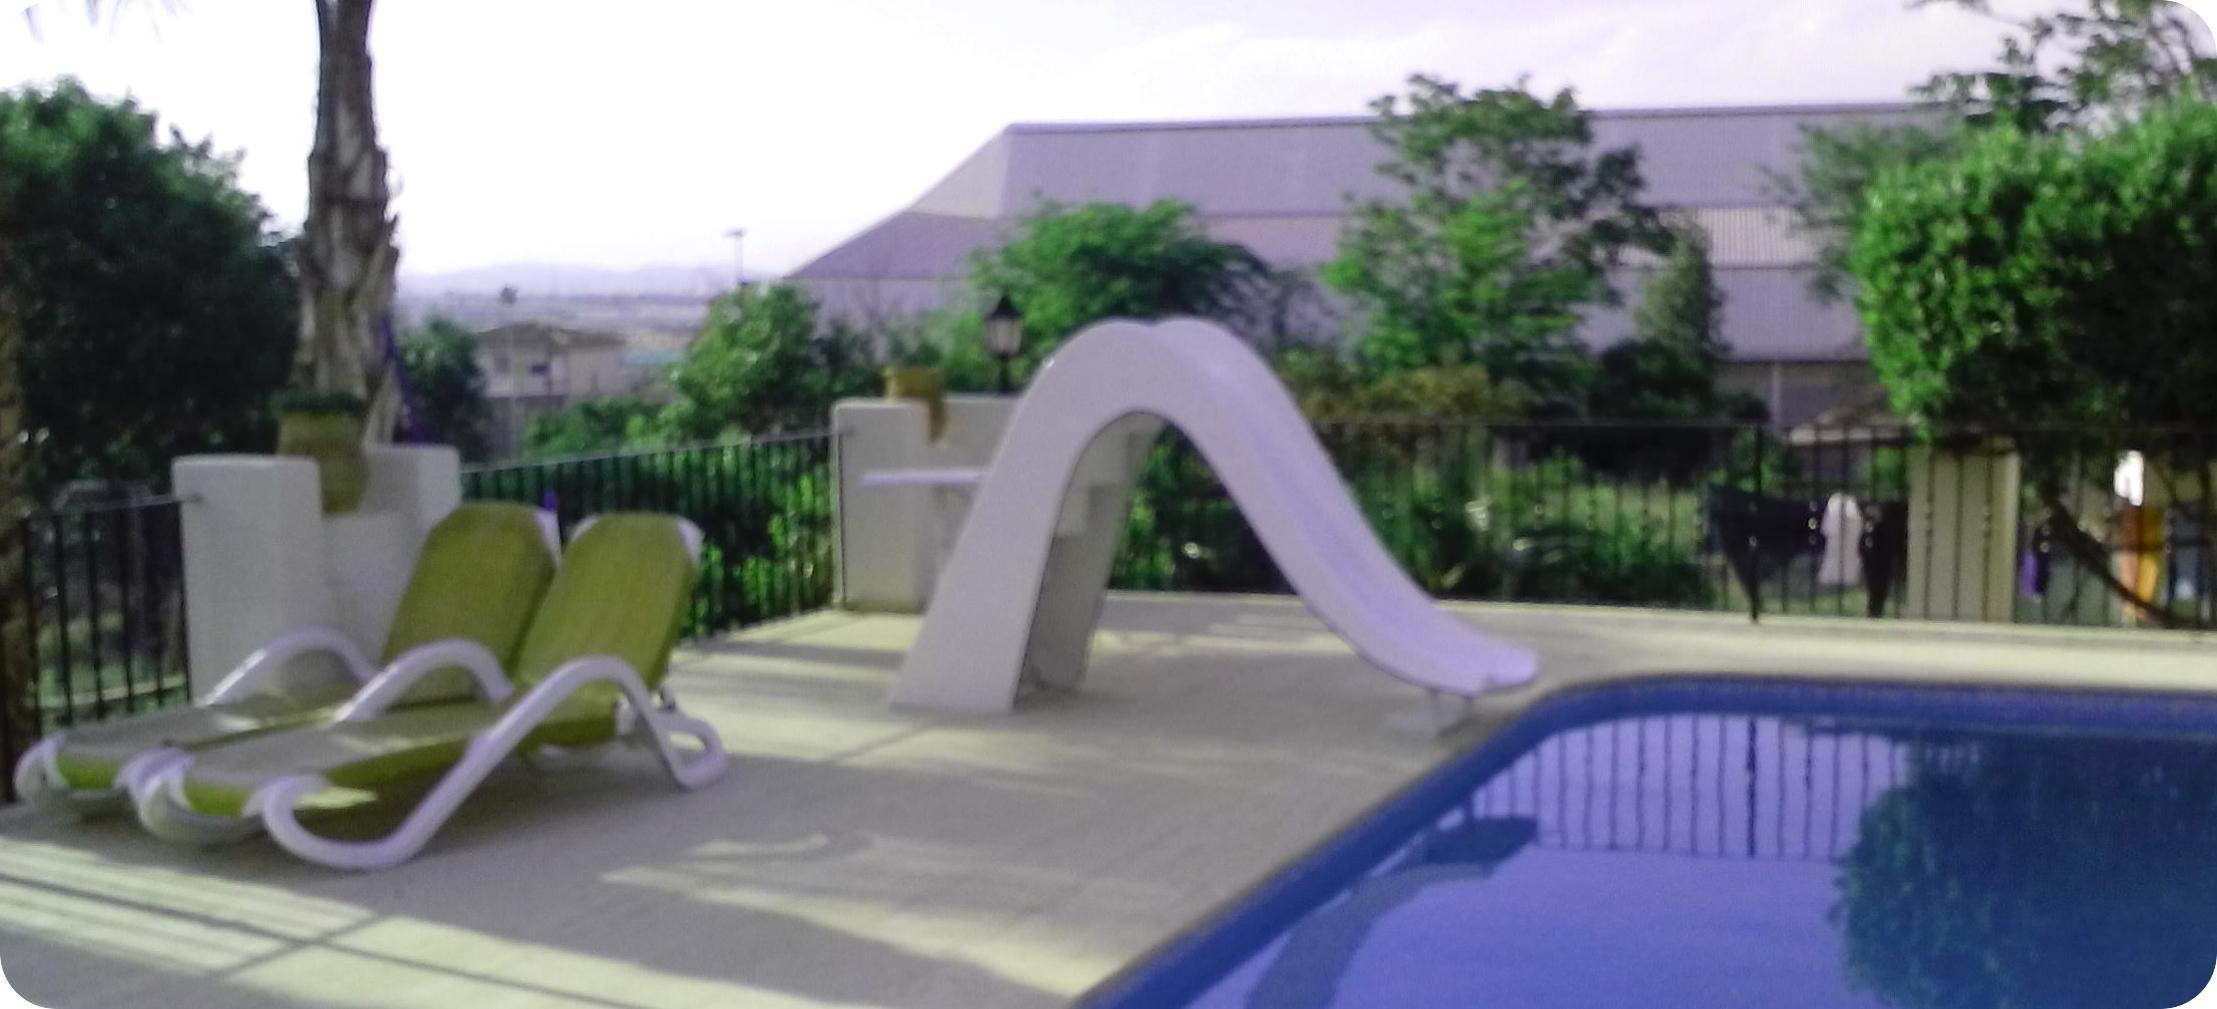 Accesorios para piscinas prefabricadas de poliester con for Precio de piscinas hinchables